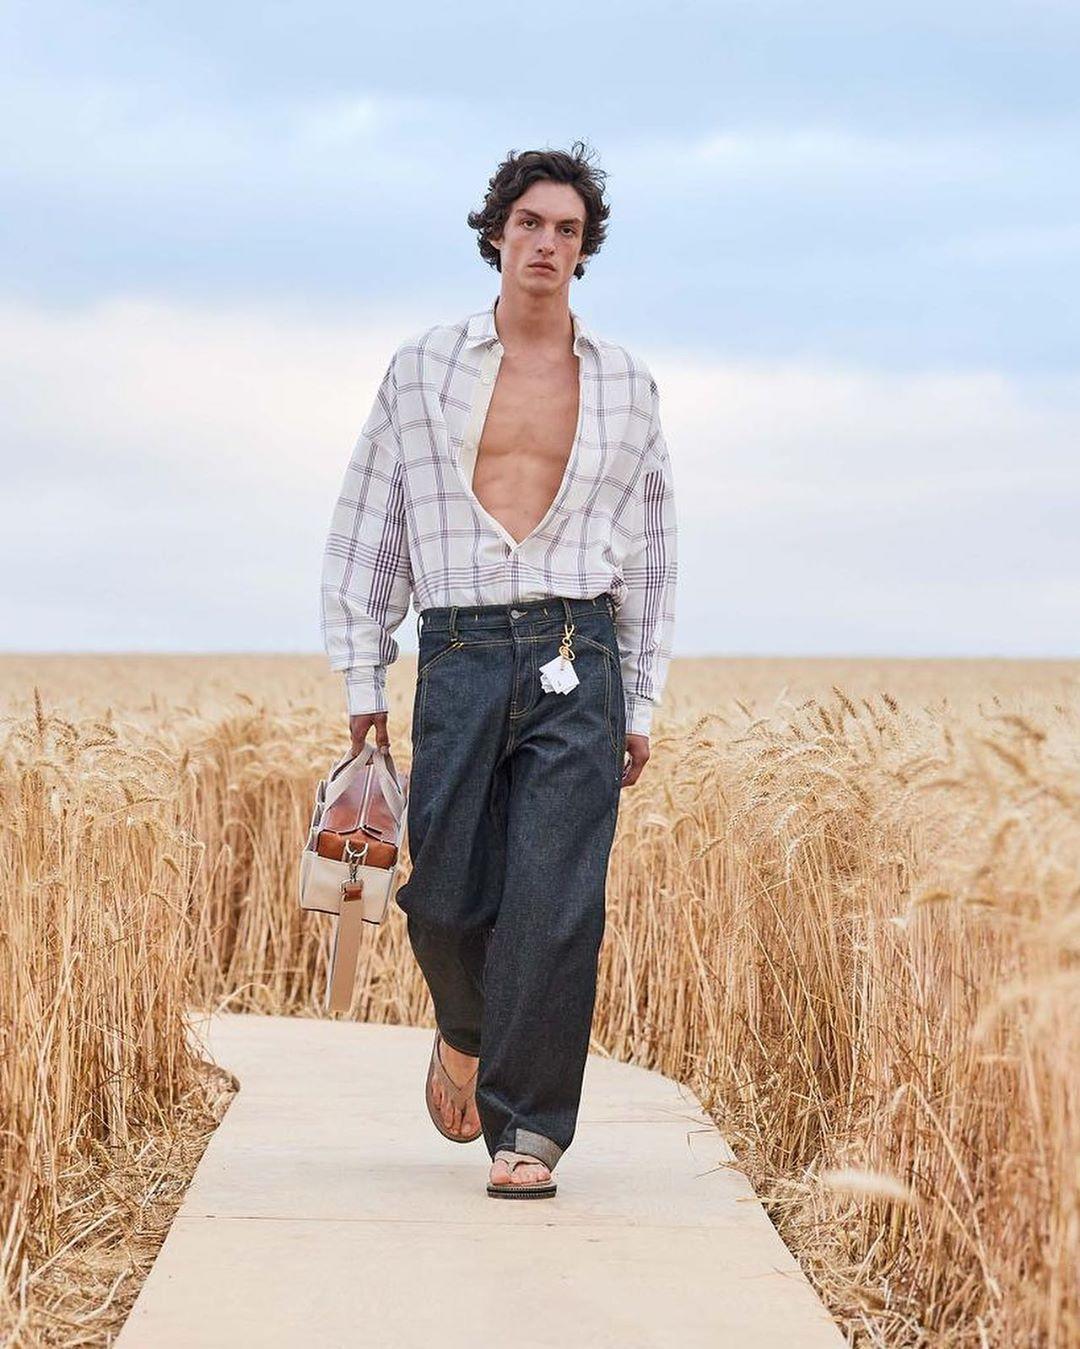 Jacquemus workwear denim jeans